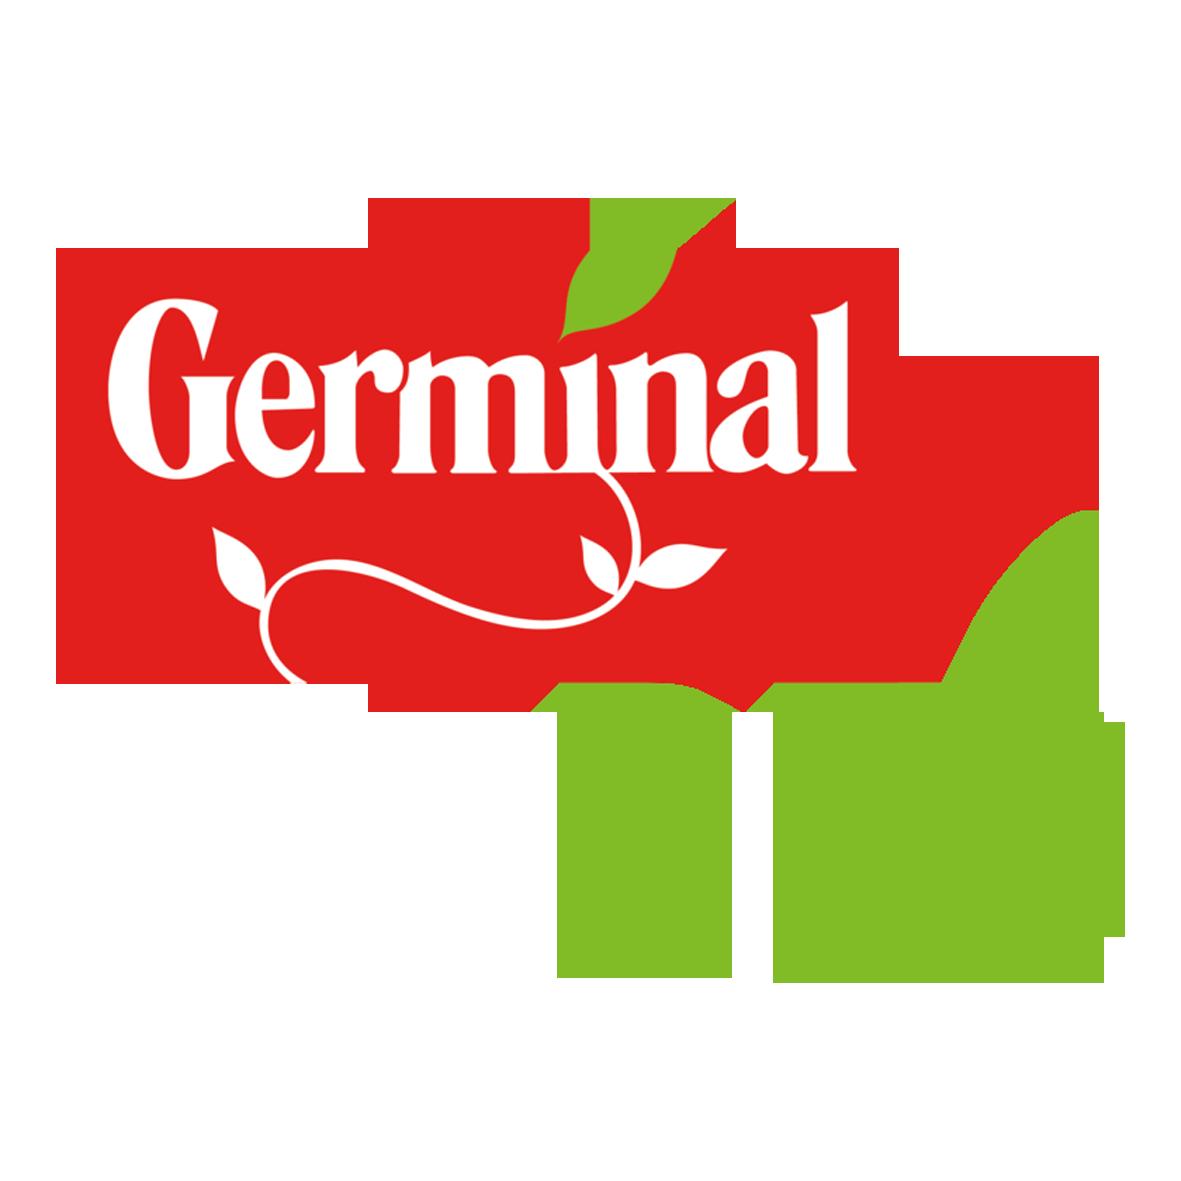 ♥ Germinal